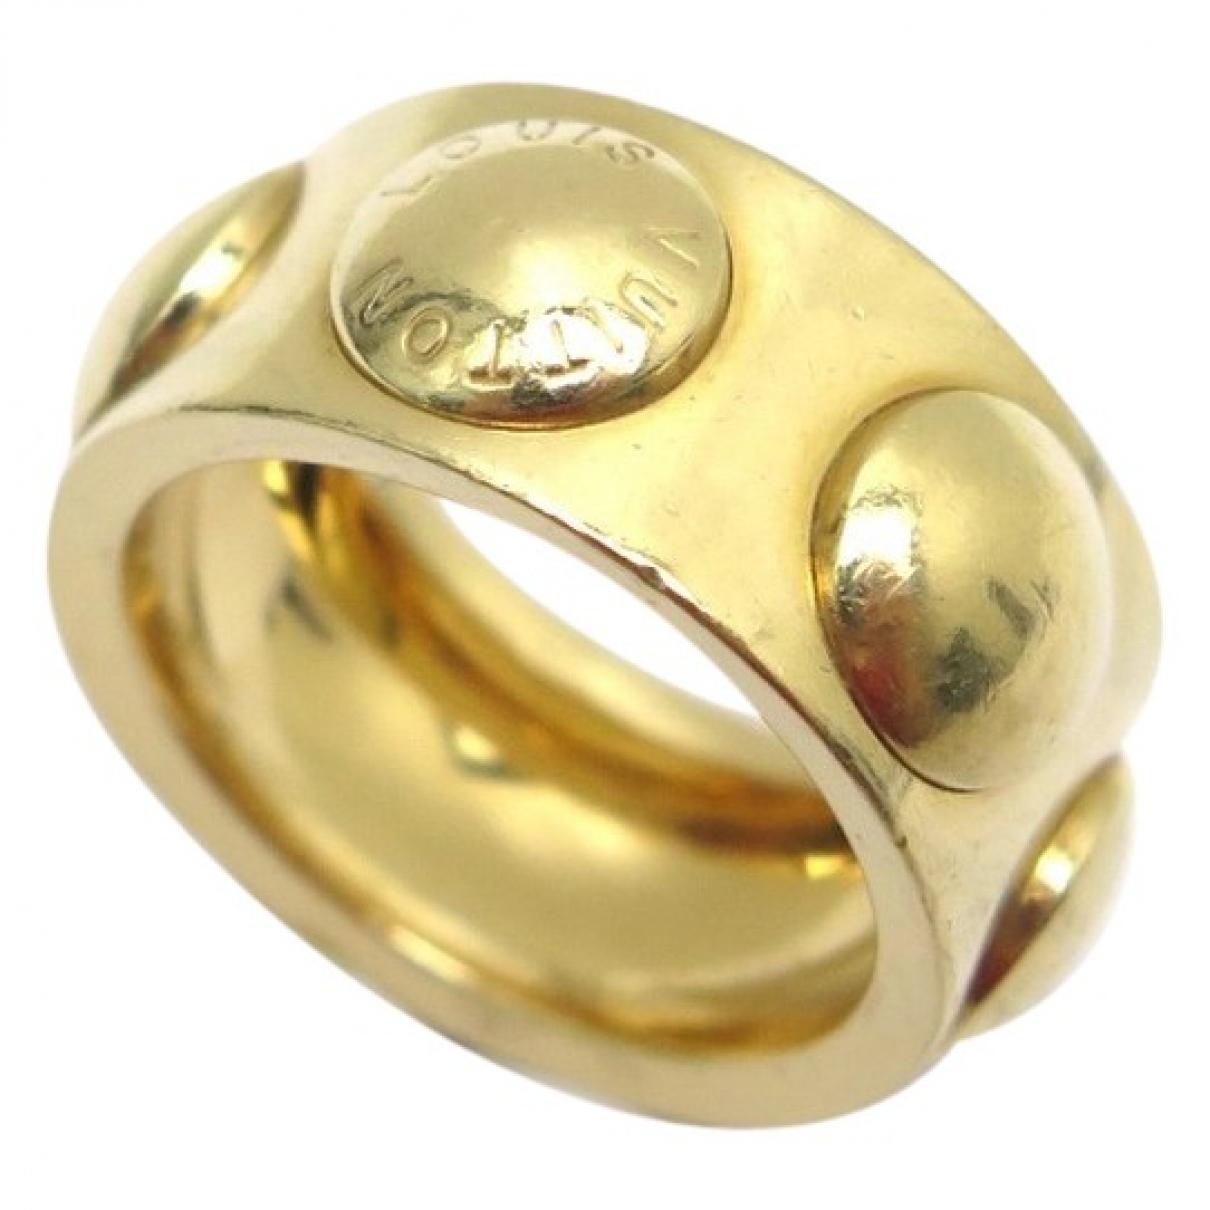 Louis Vuitton Empreinte Gold Yellow gold ring for Women 44 MM